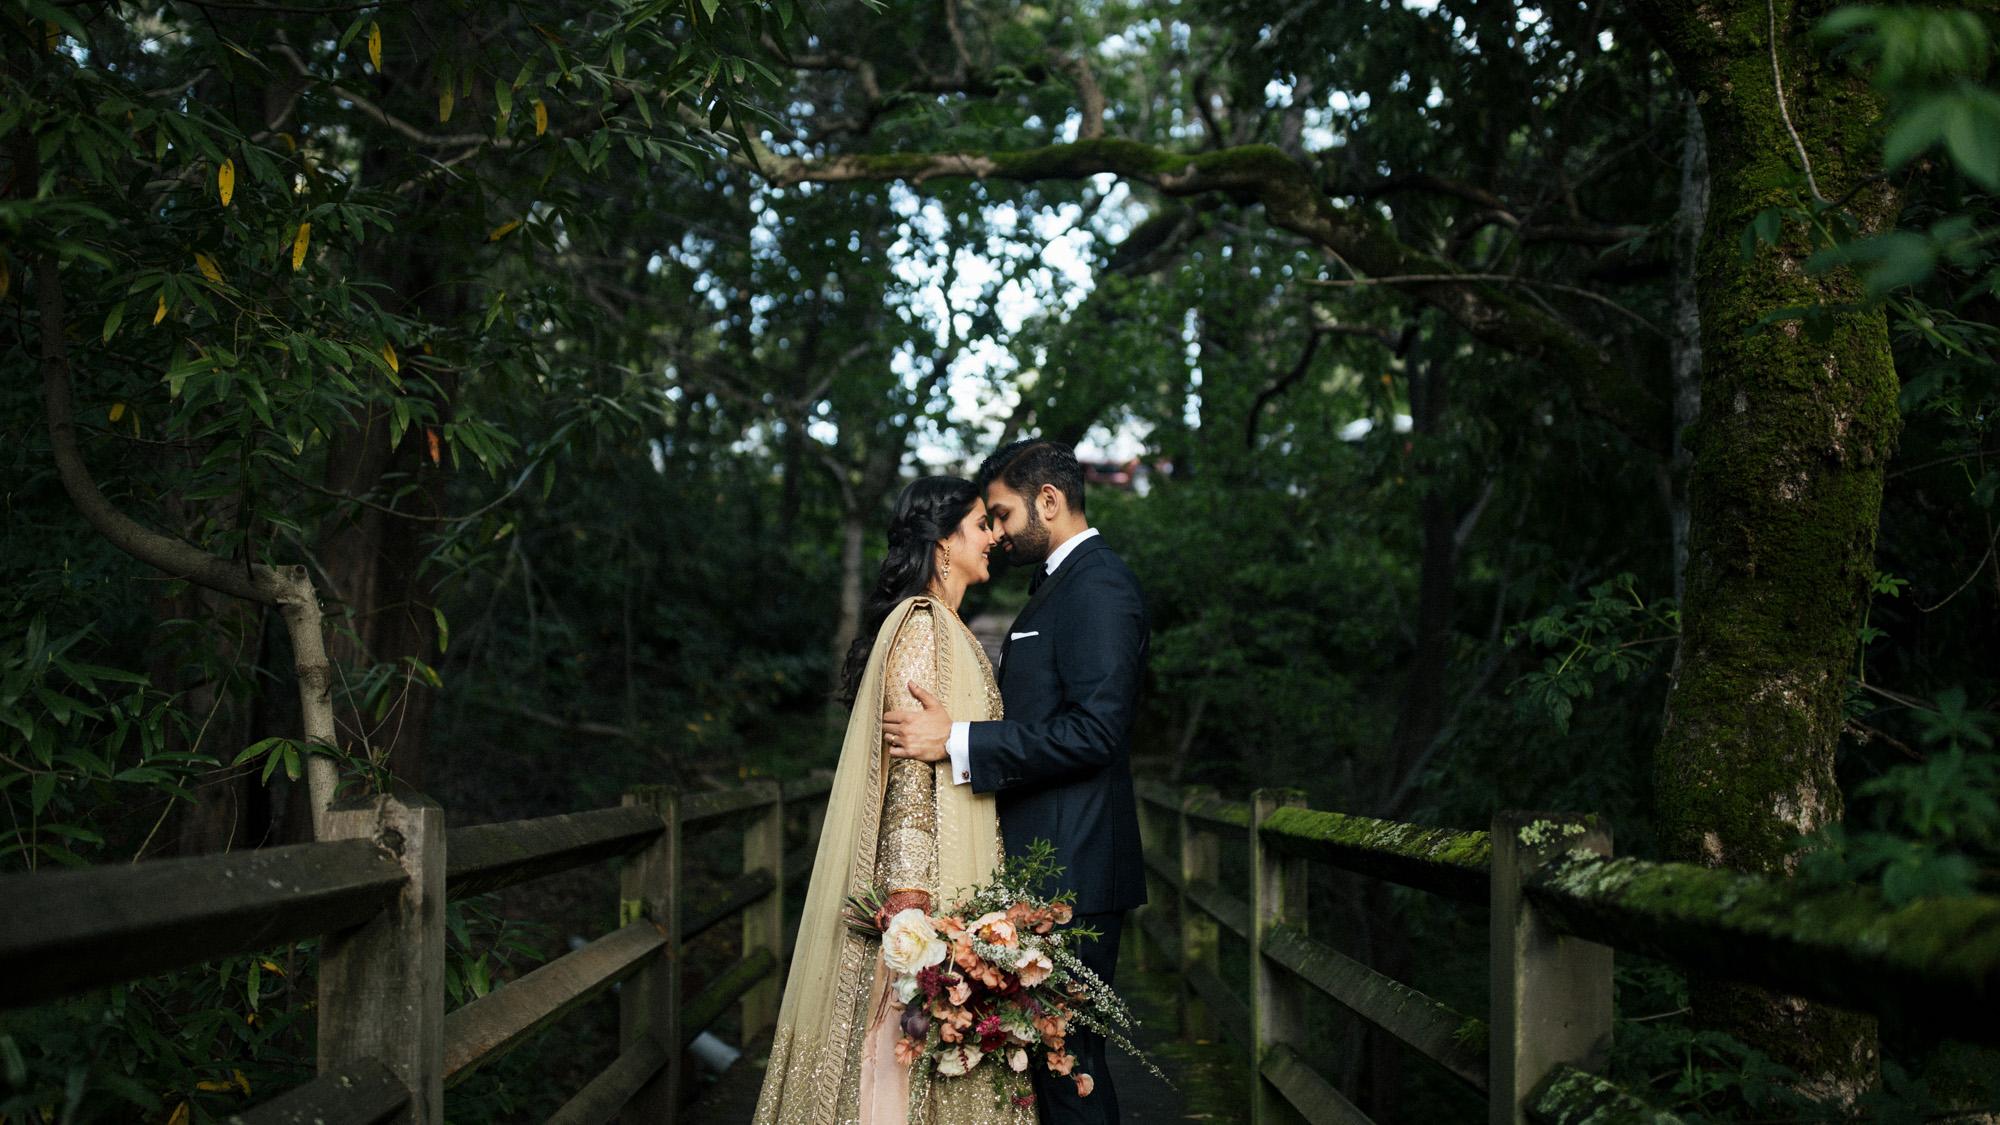 anu_maneesh_alec_vanderboom_Indian_wedding_photography-0141.jpg